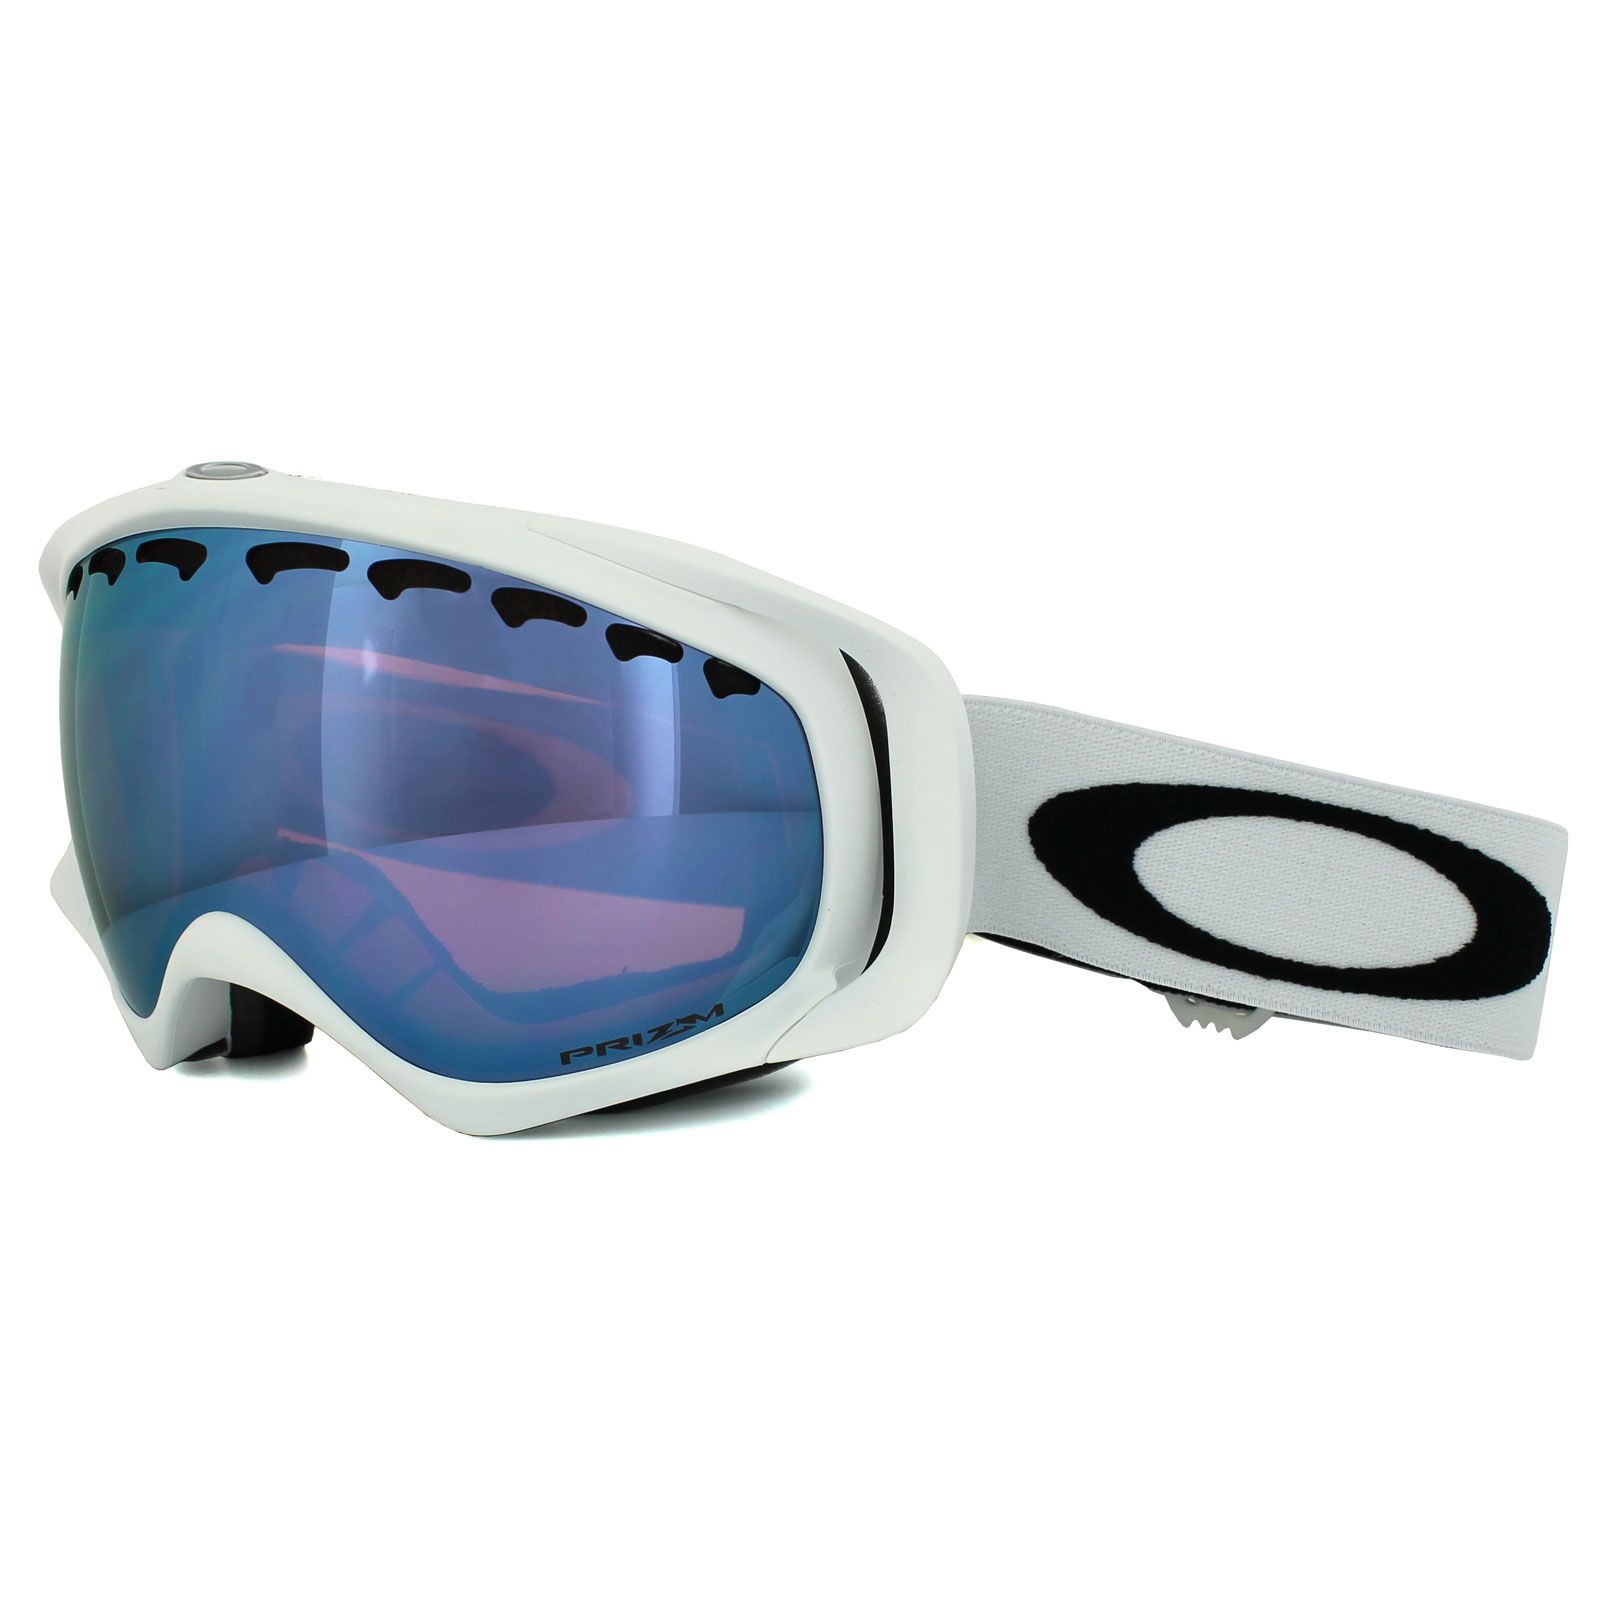 oakley ski goggles crowbar  Oakley Ski Snow Goggles Crowbar OO7005-36 Matt White Prizm ...